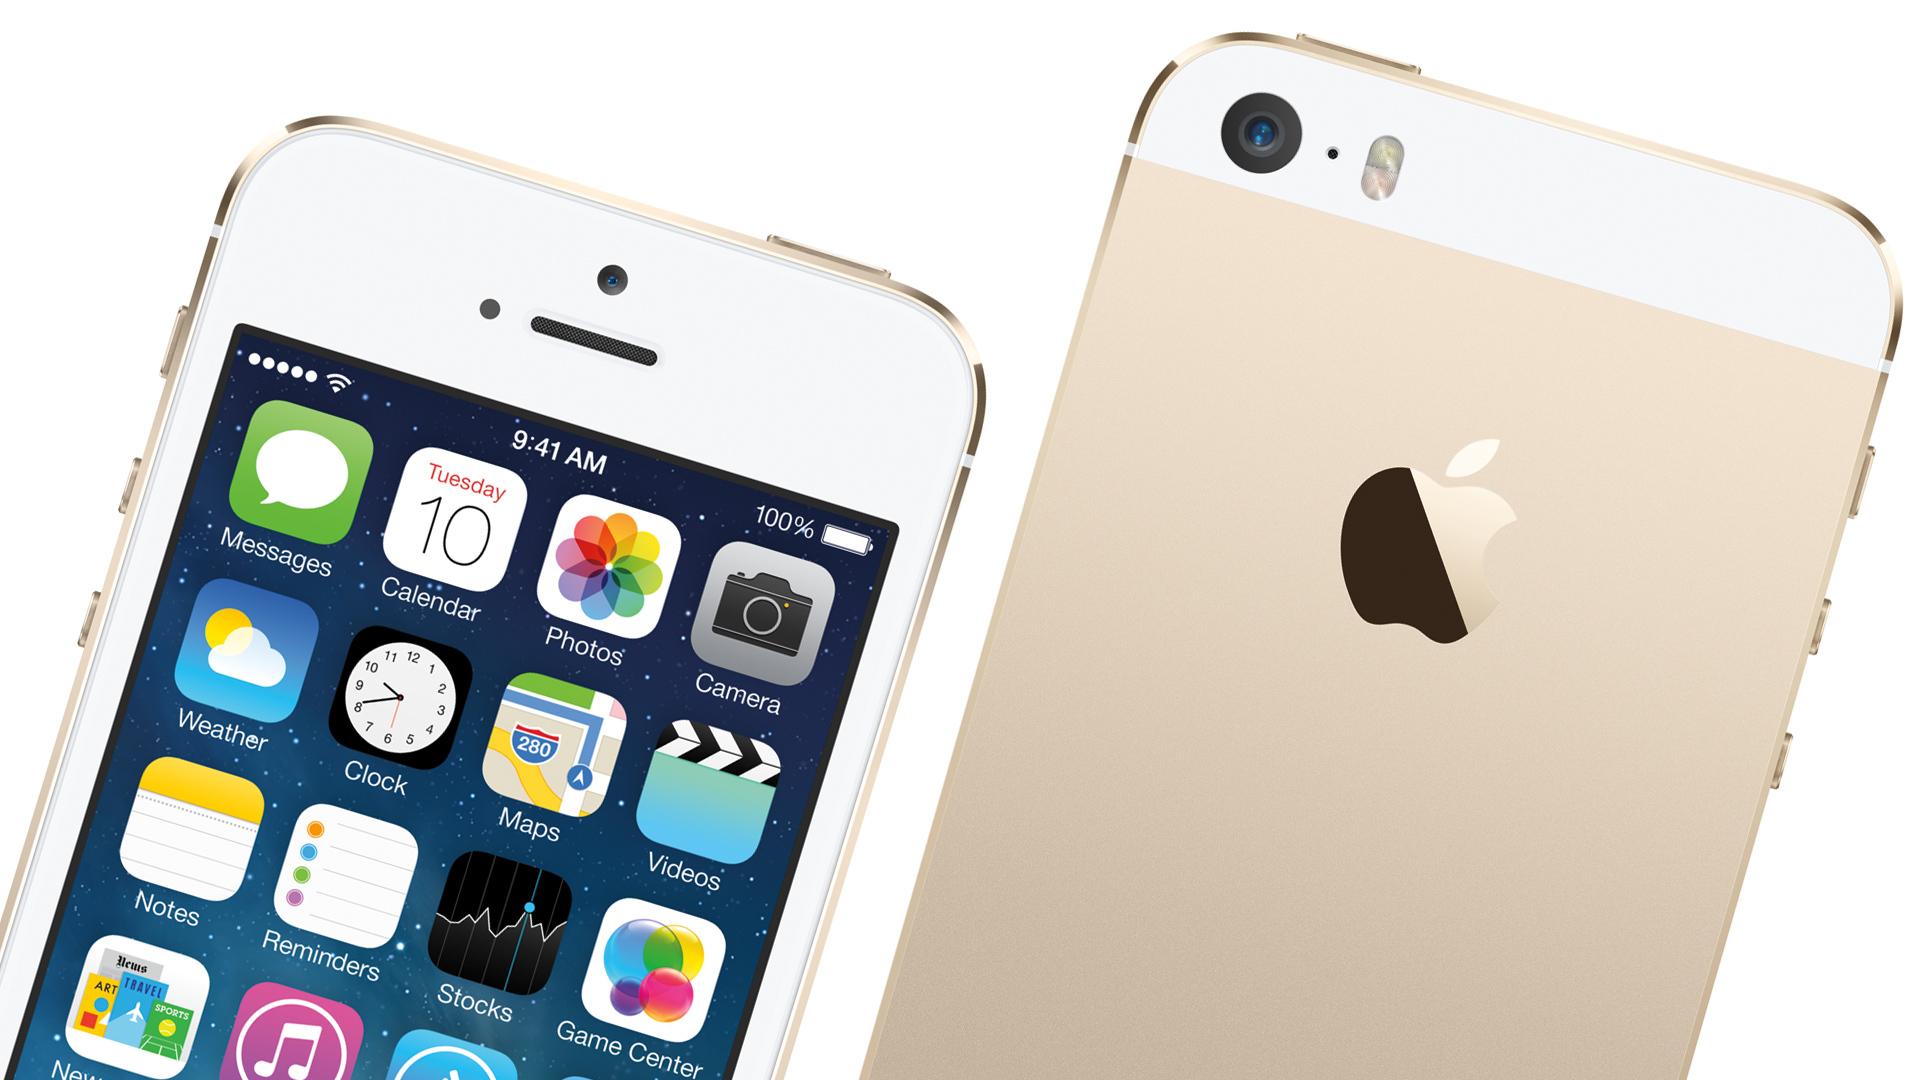 Apple компаниясына 25 млн евро айыппұл салынды - на weekend.bugin.kz